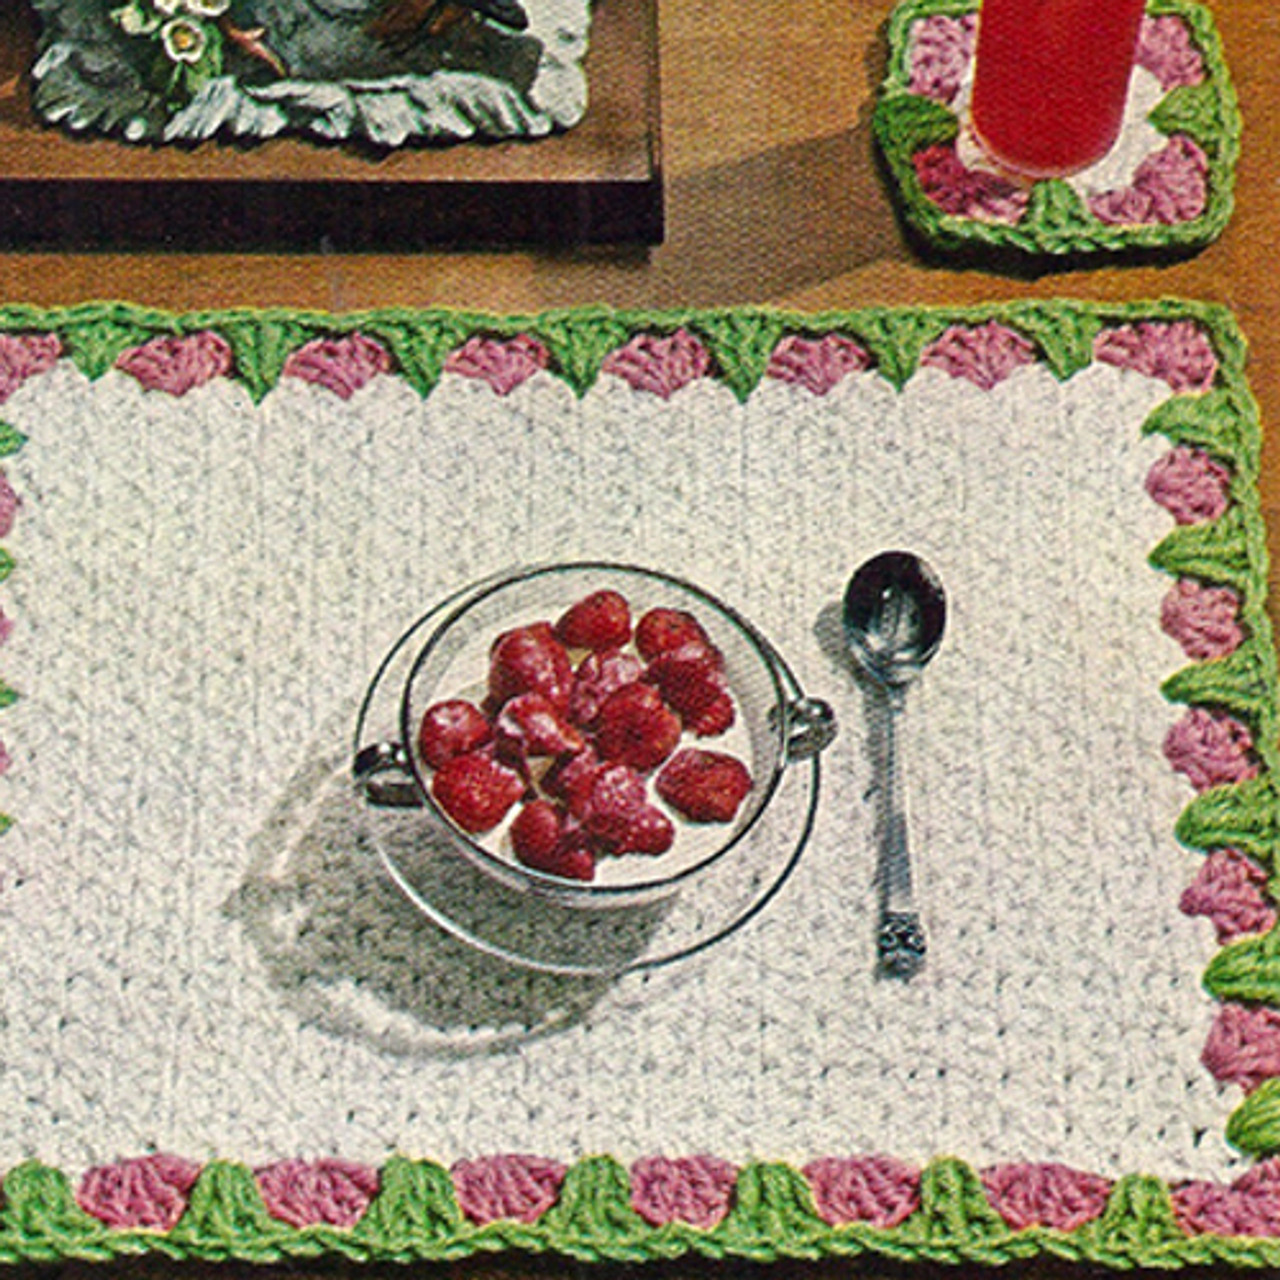 Flower Bordered Crochet Place Mats Pattern